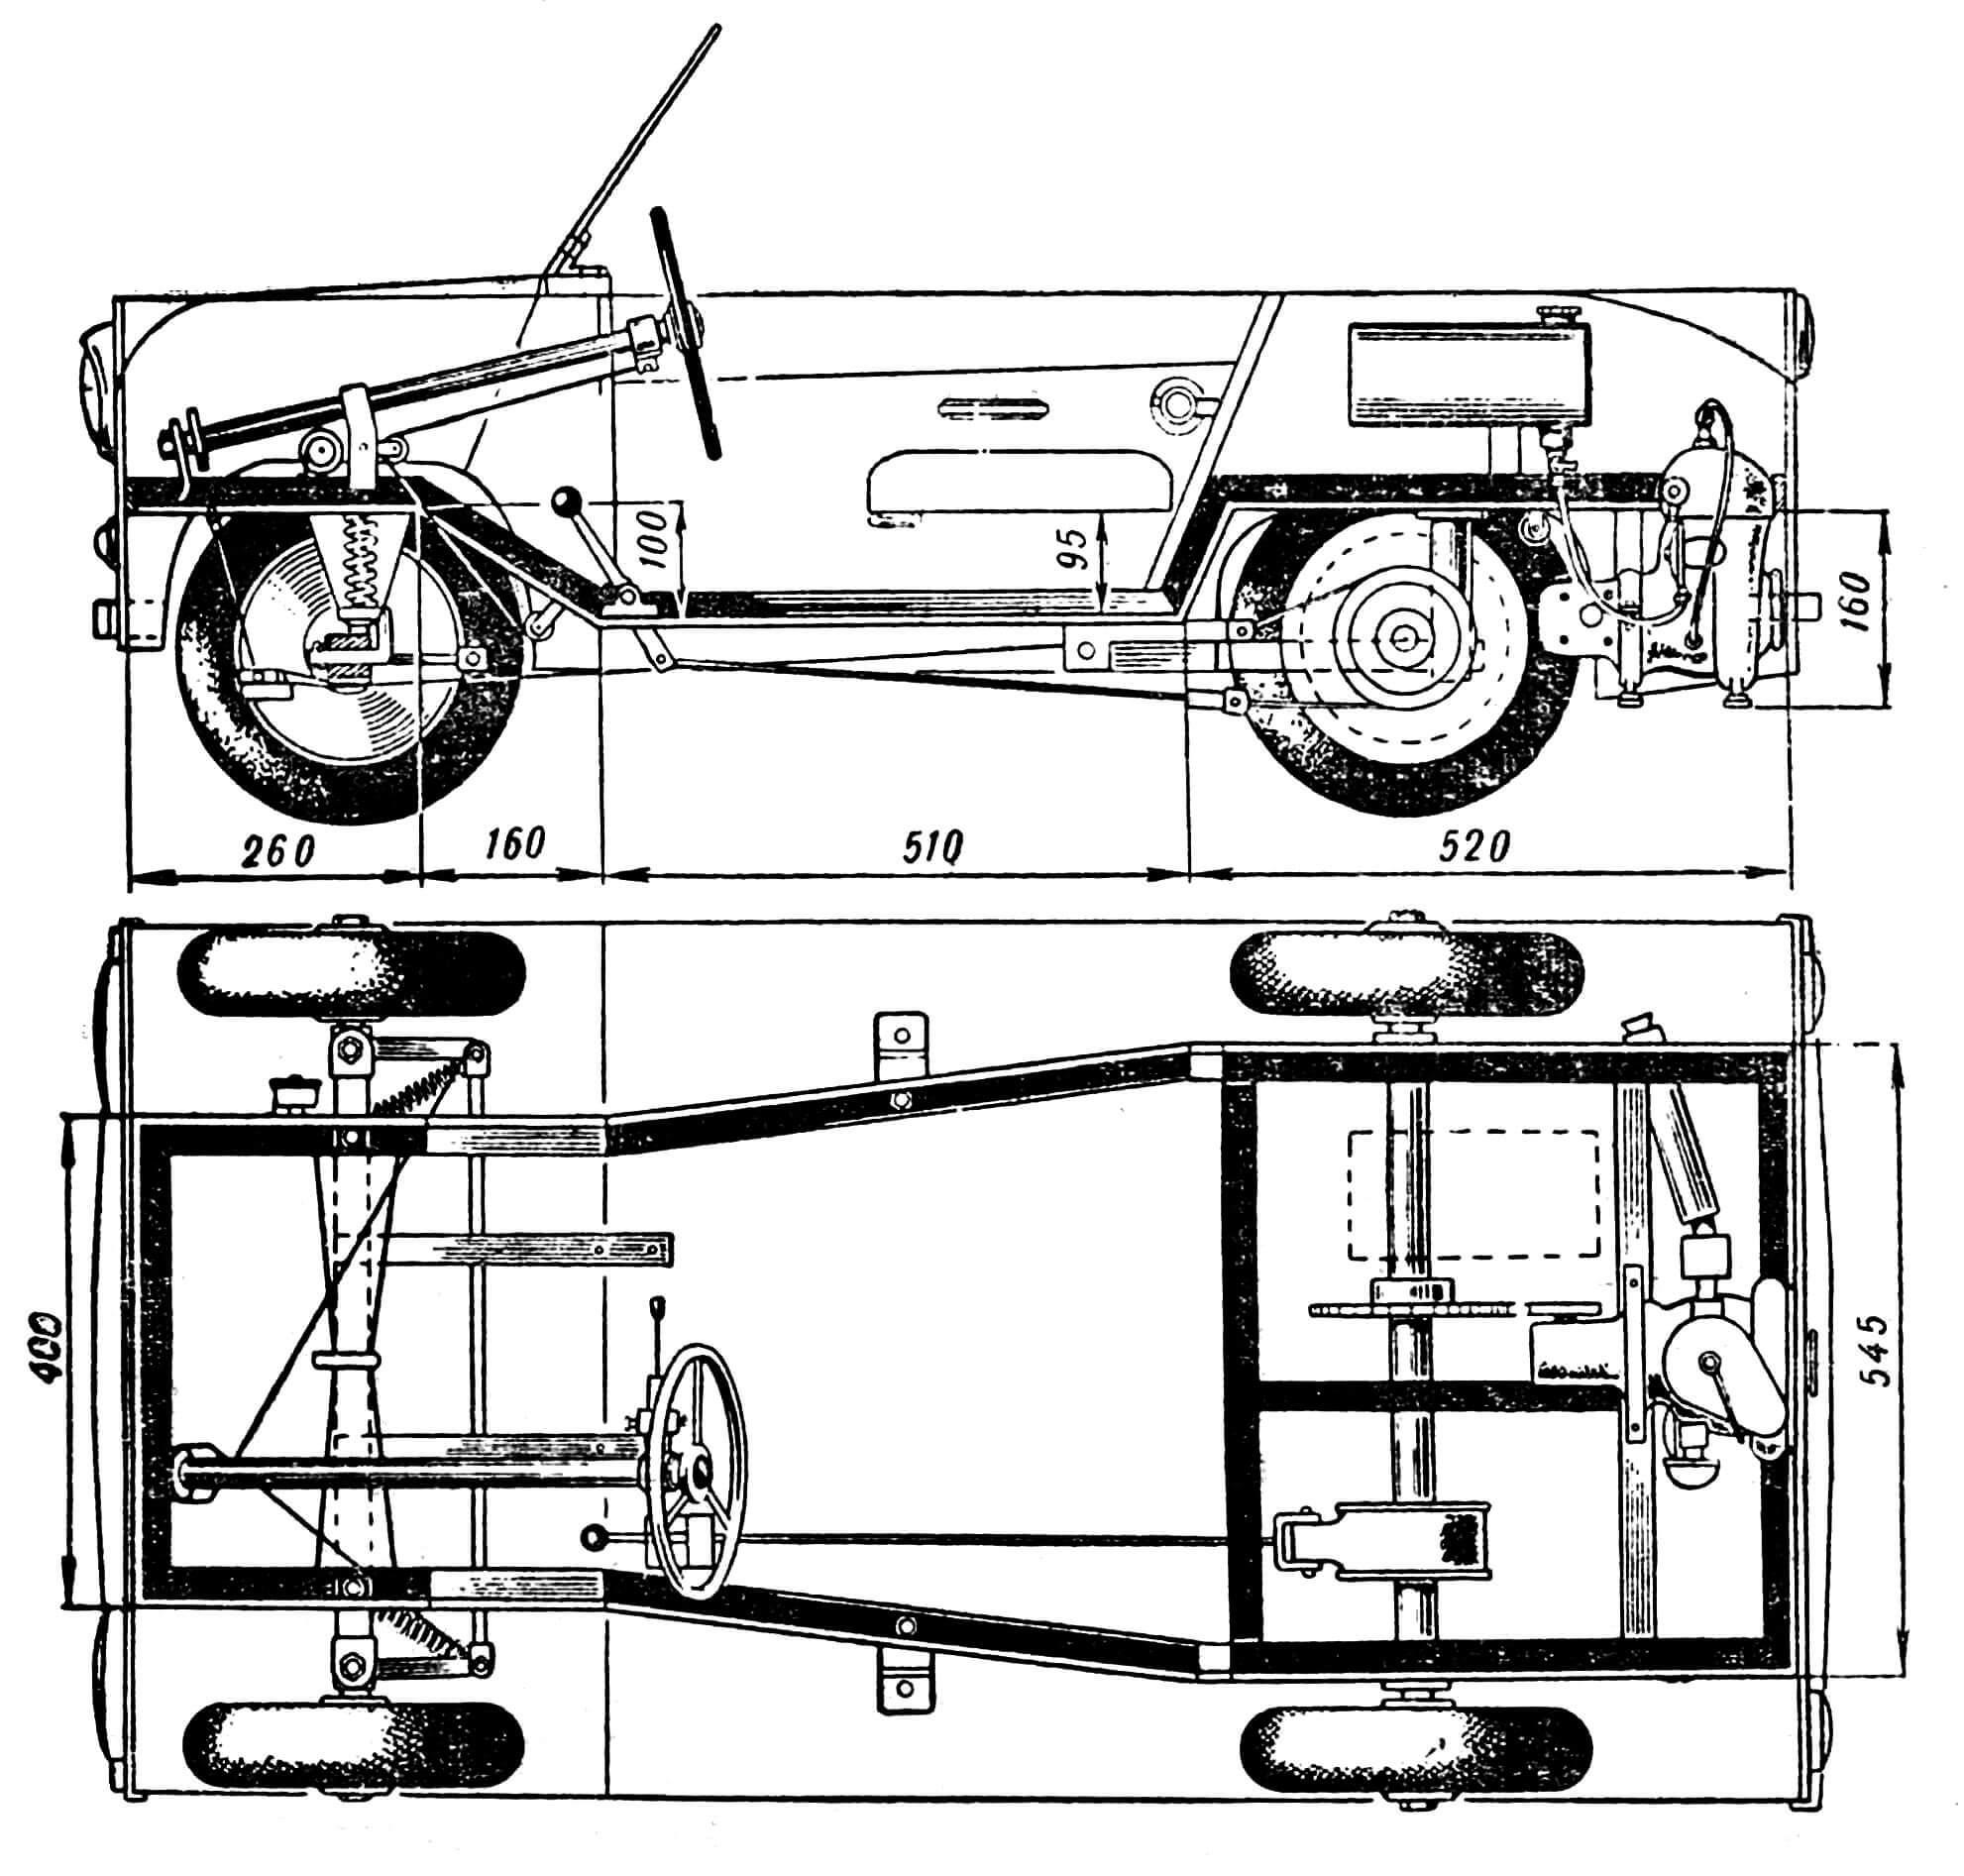 Рис 1. Вид машини сбоку и сверху